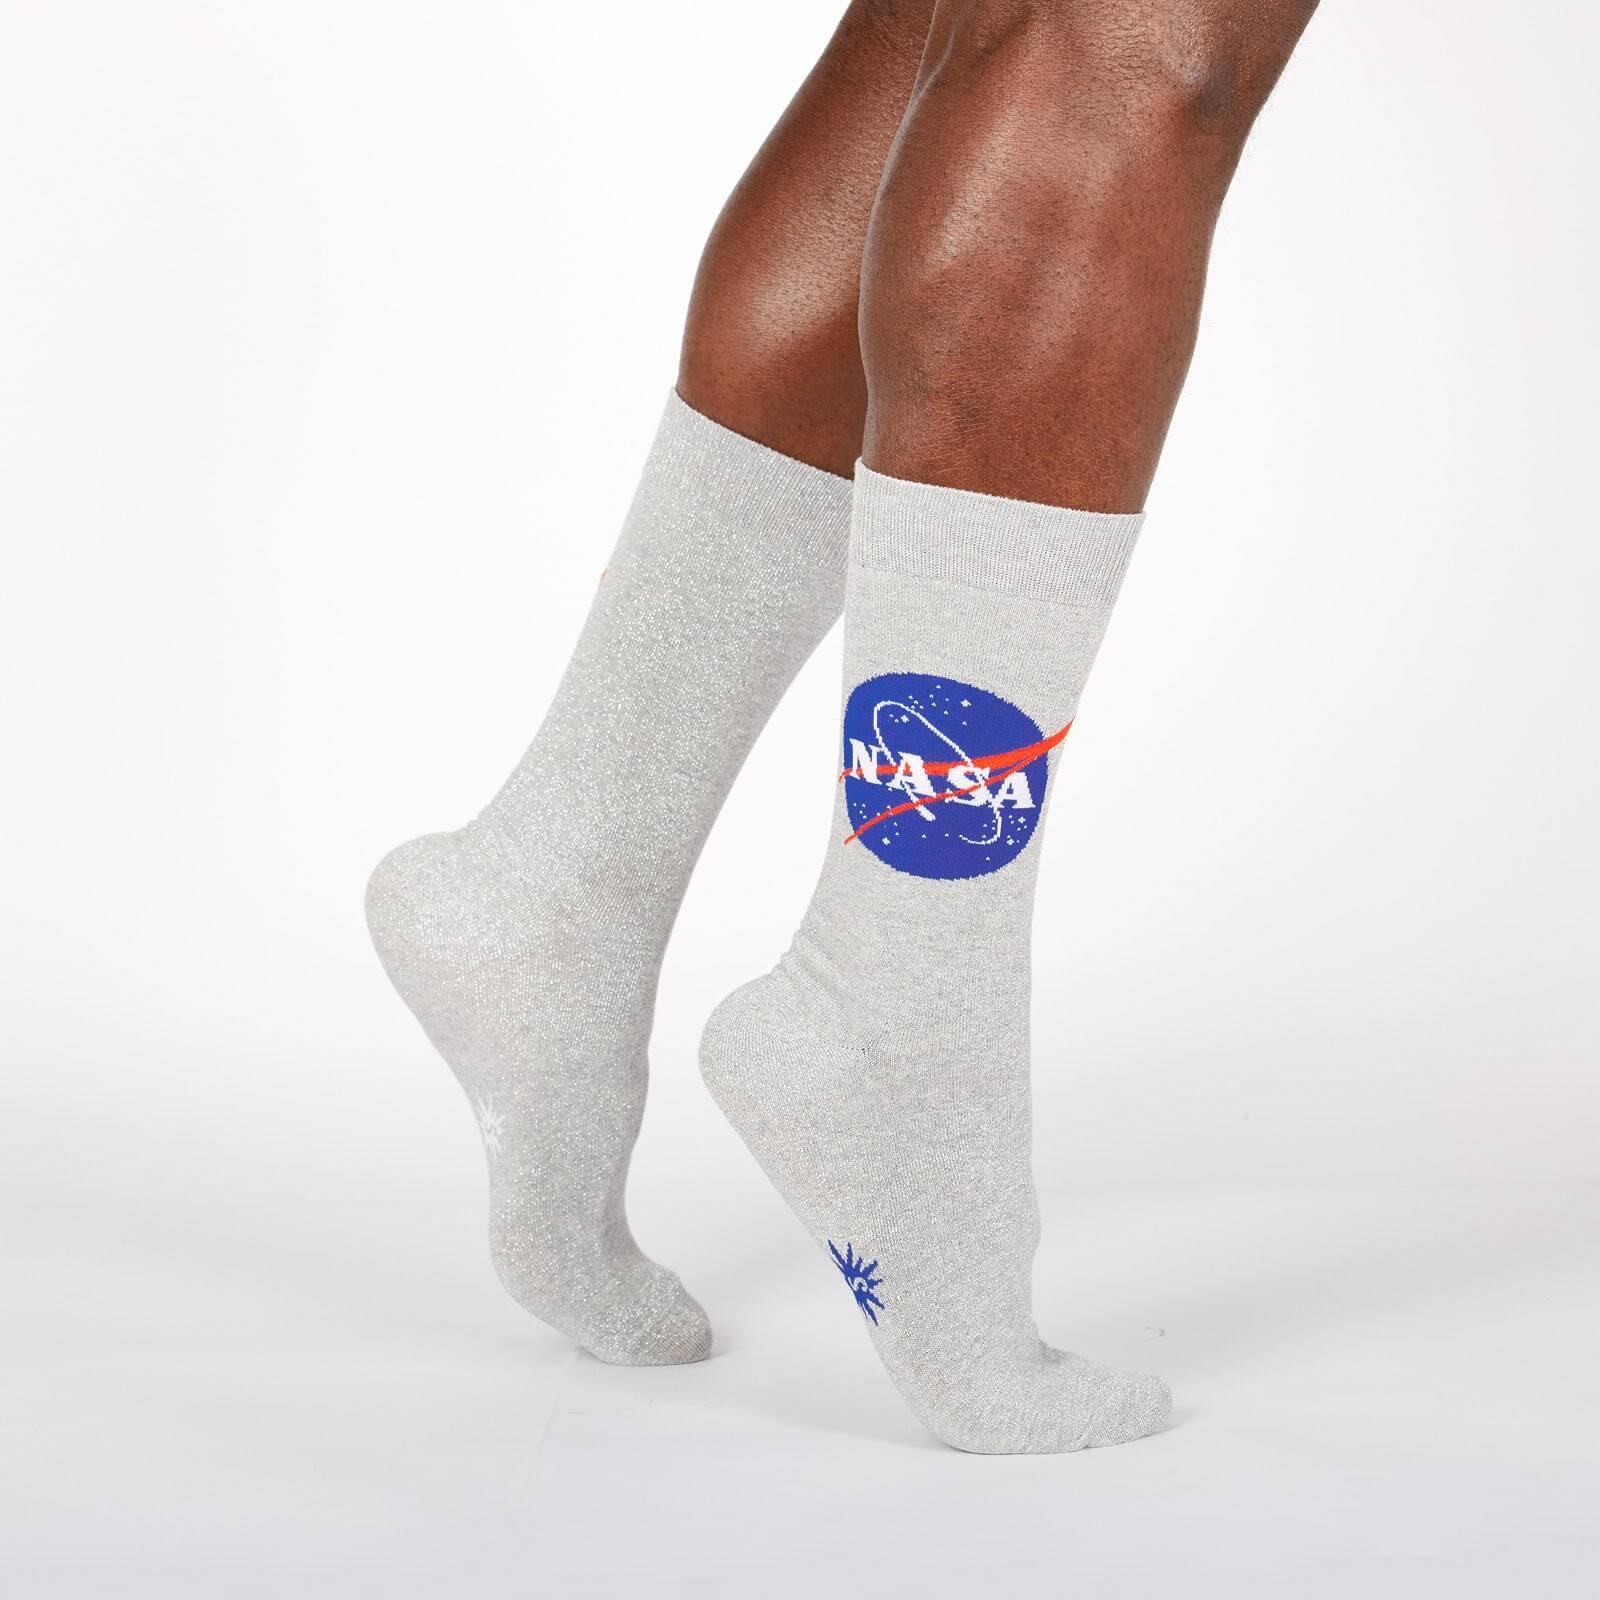 model wearing Titanium - 50th Anniversary Moon Landing NASA Metallic Thread Shimmer Crew Socks Grey - Men's